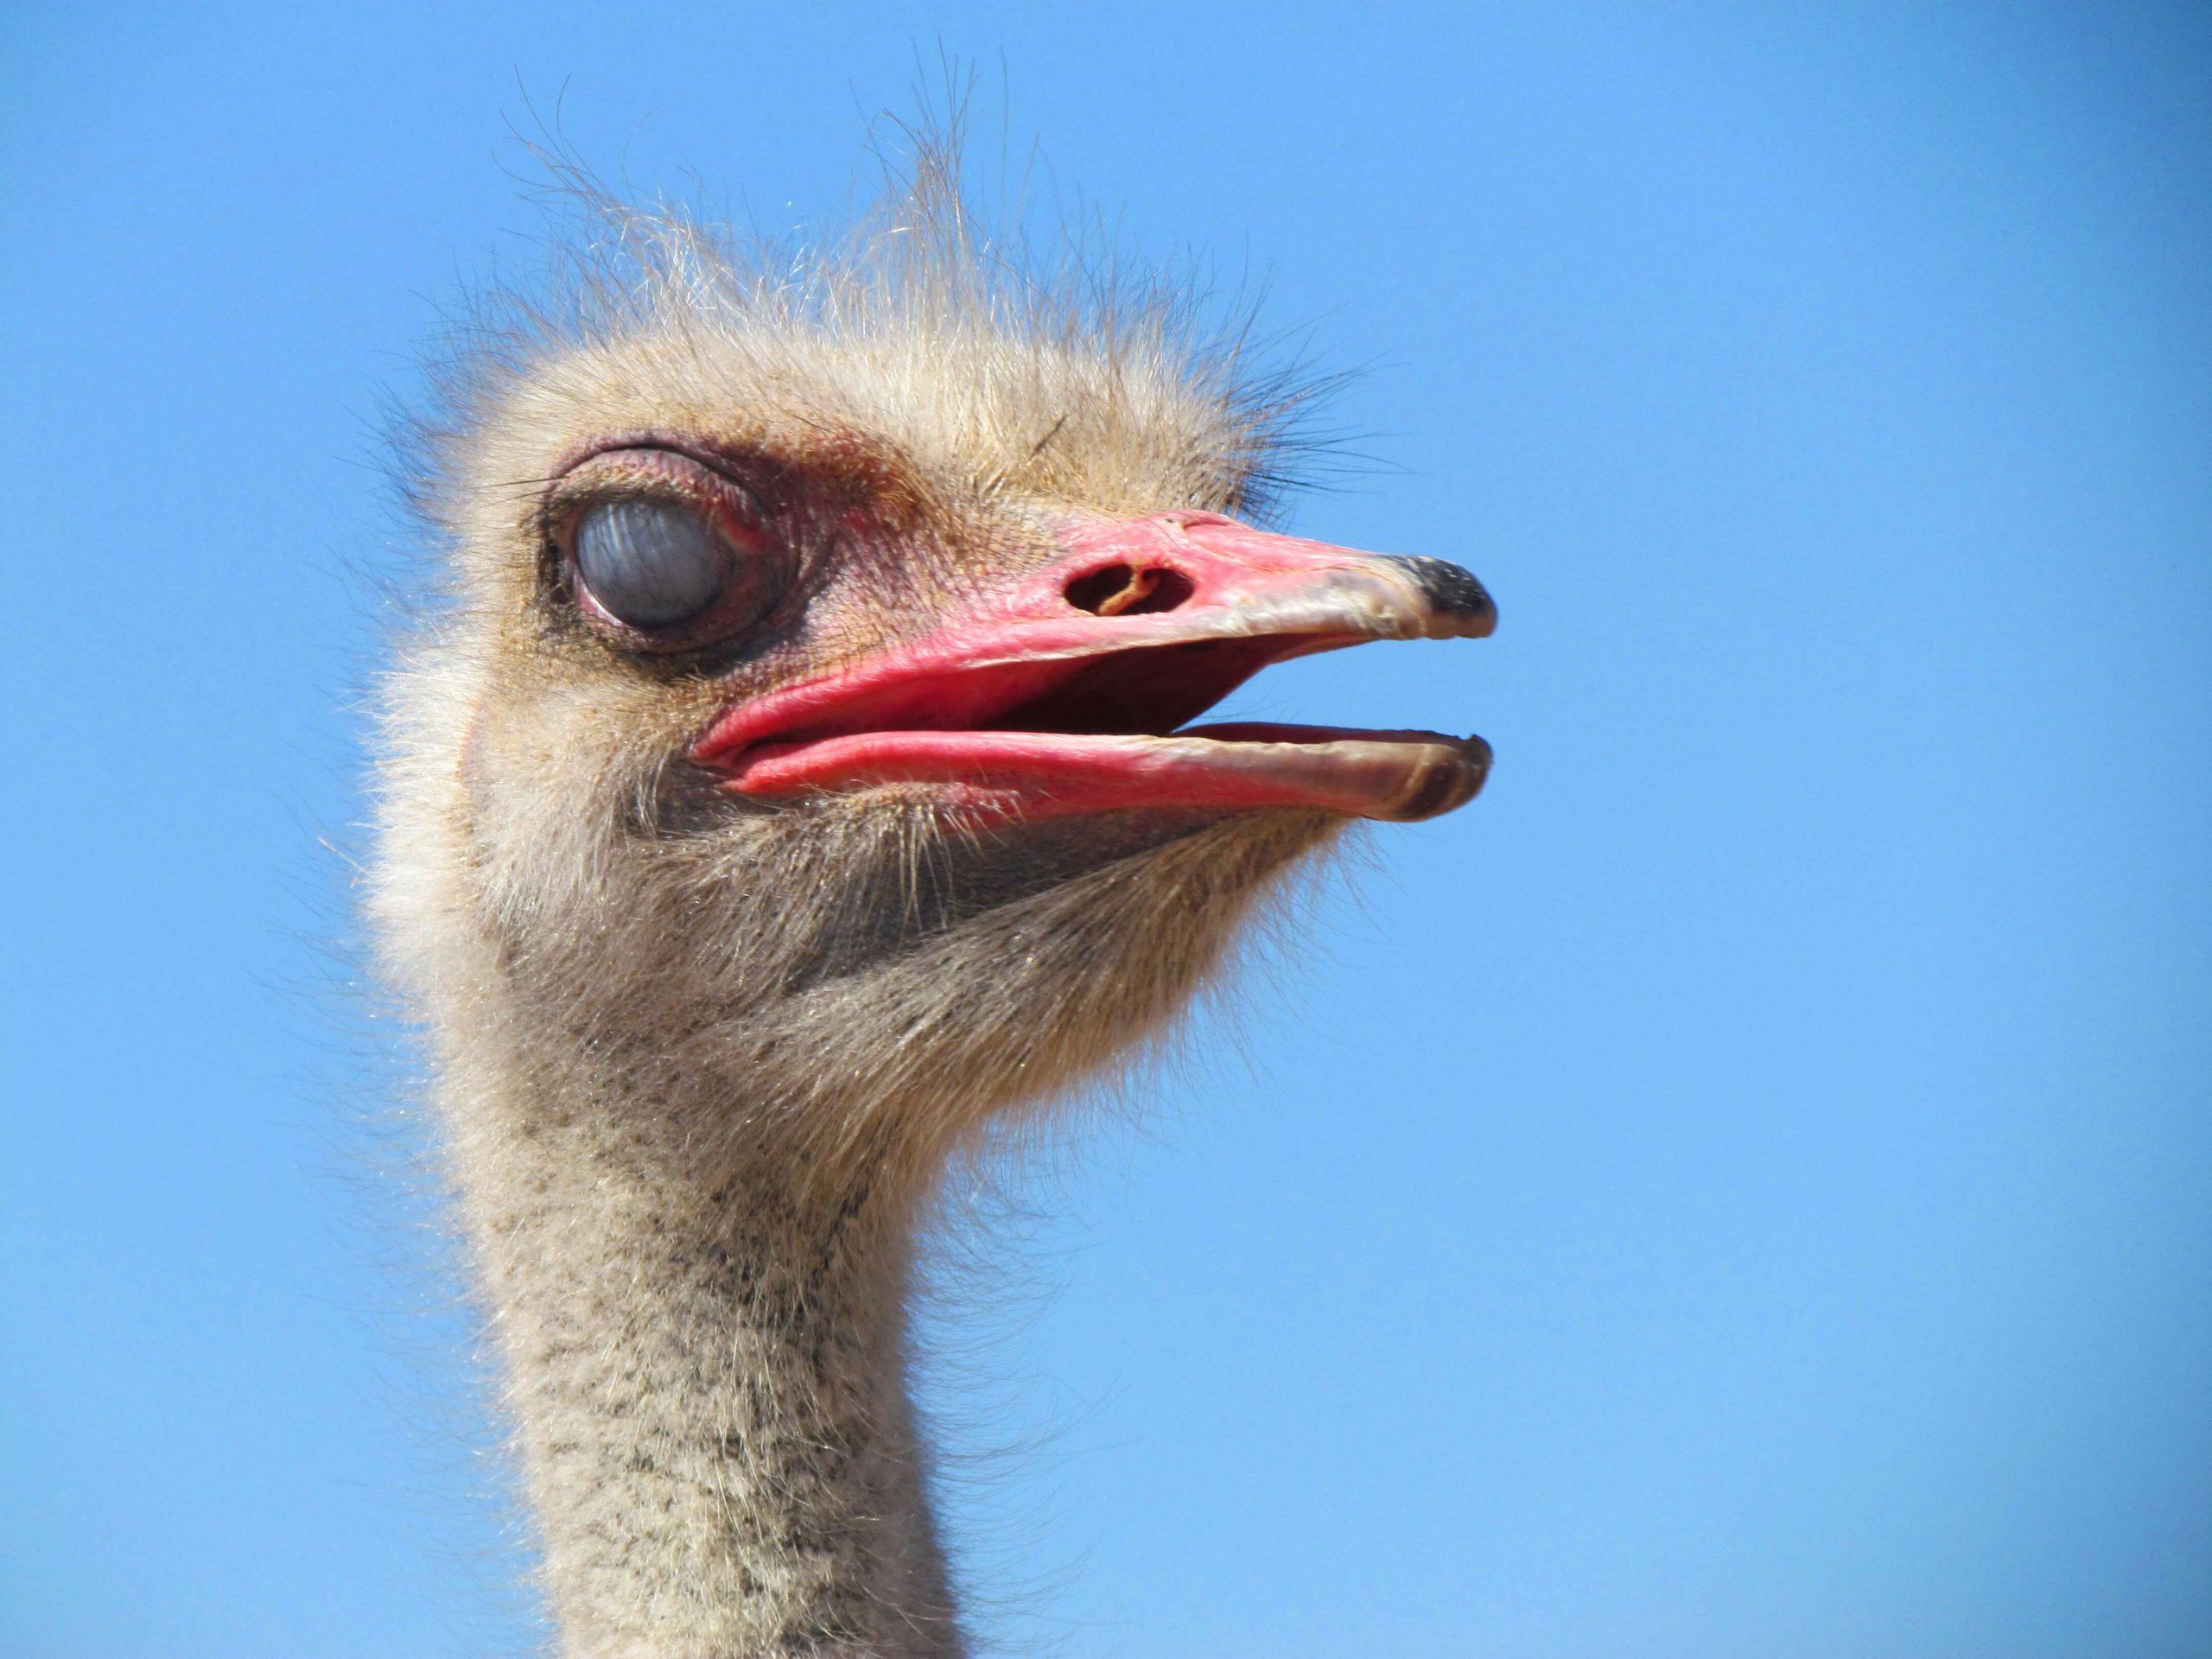 Oudtshoorn ostrich face close-up